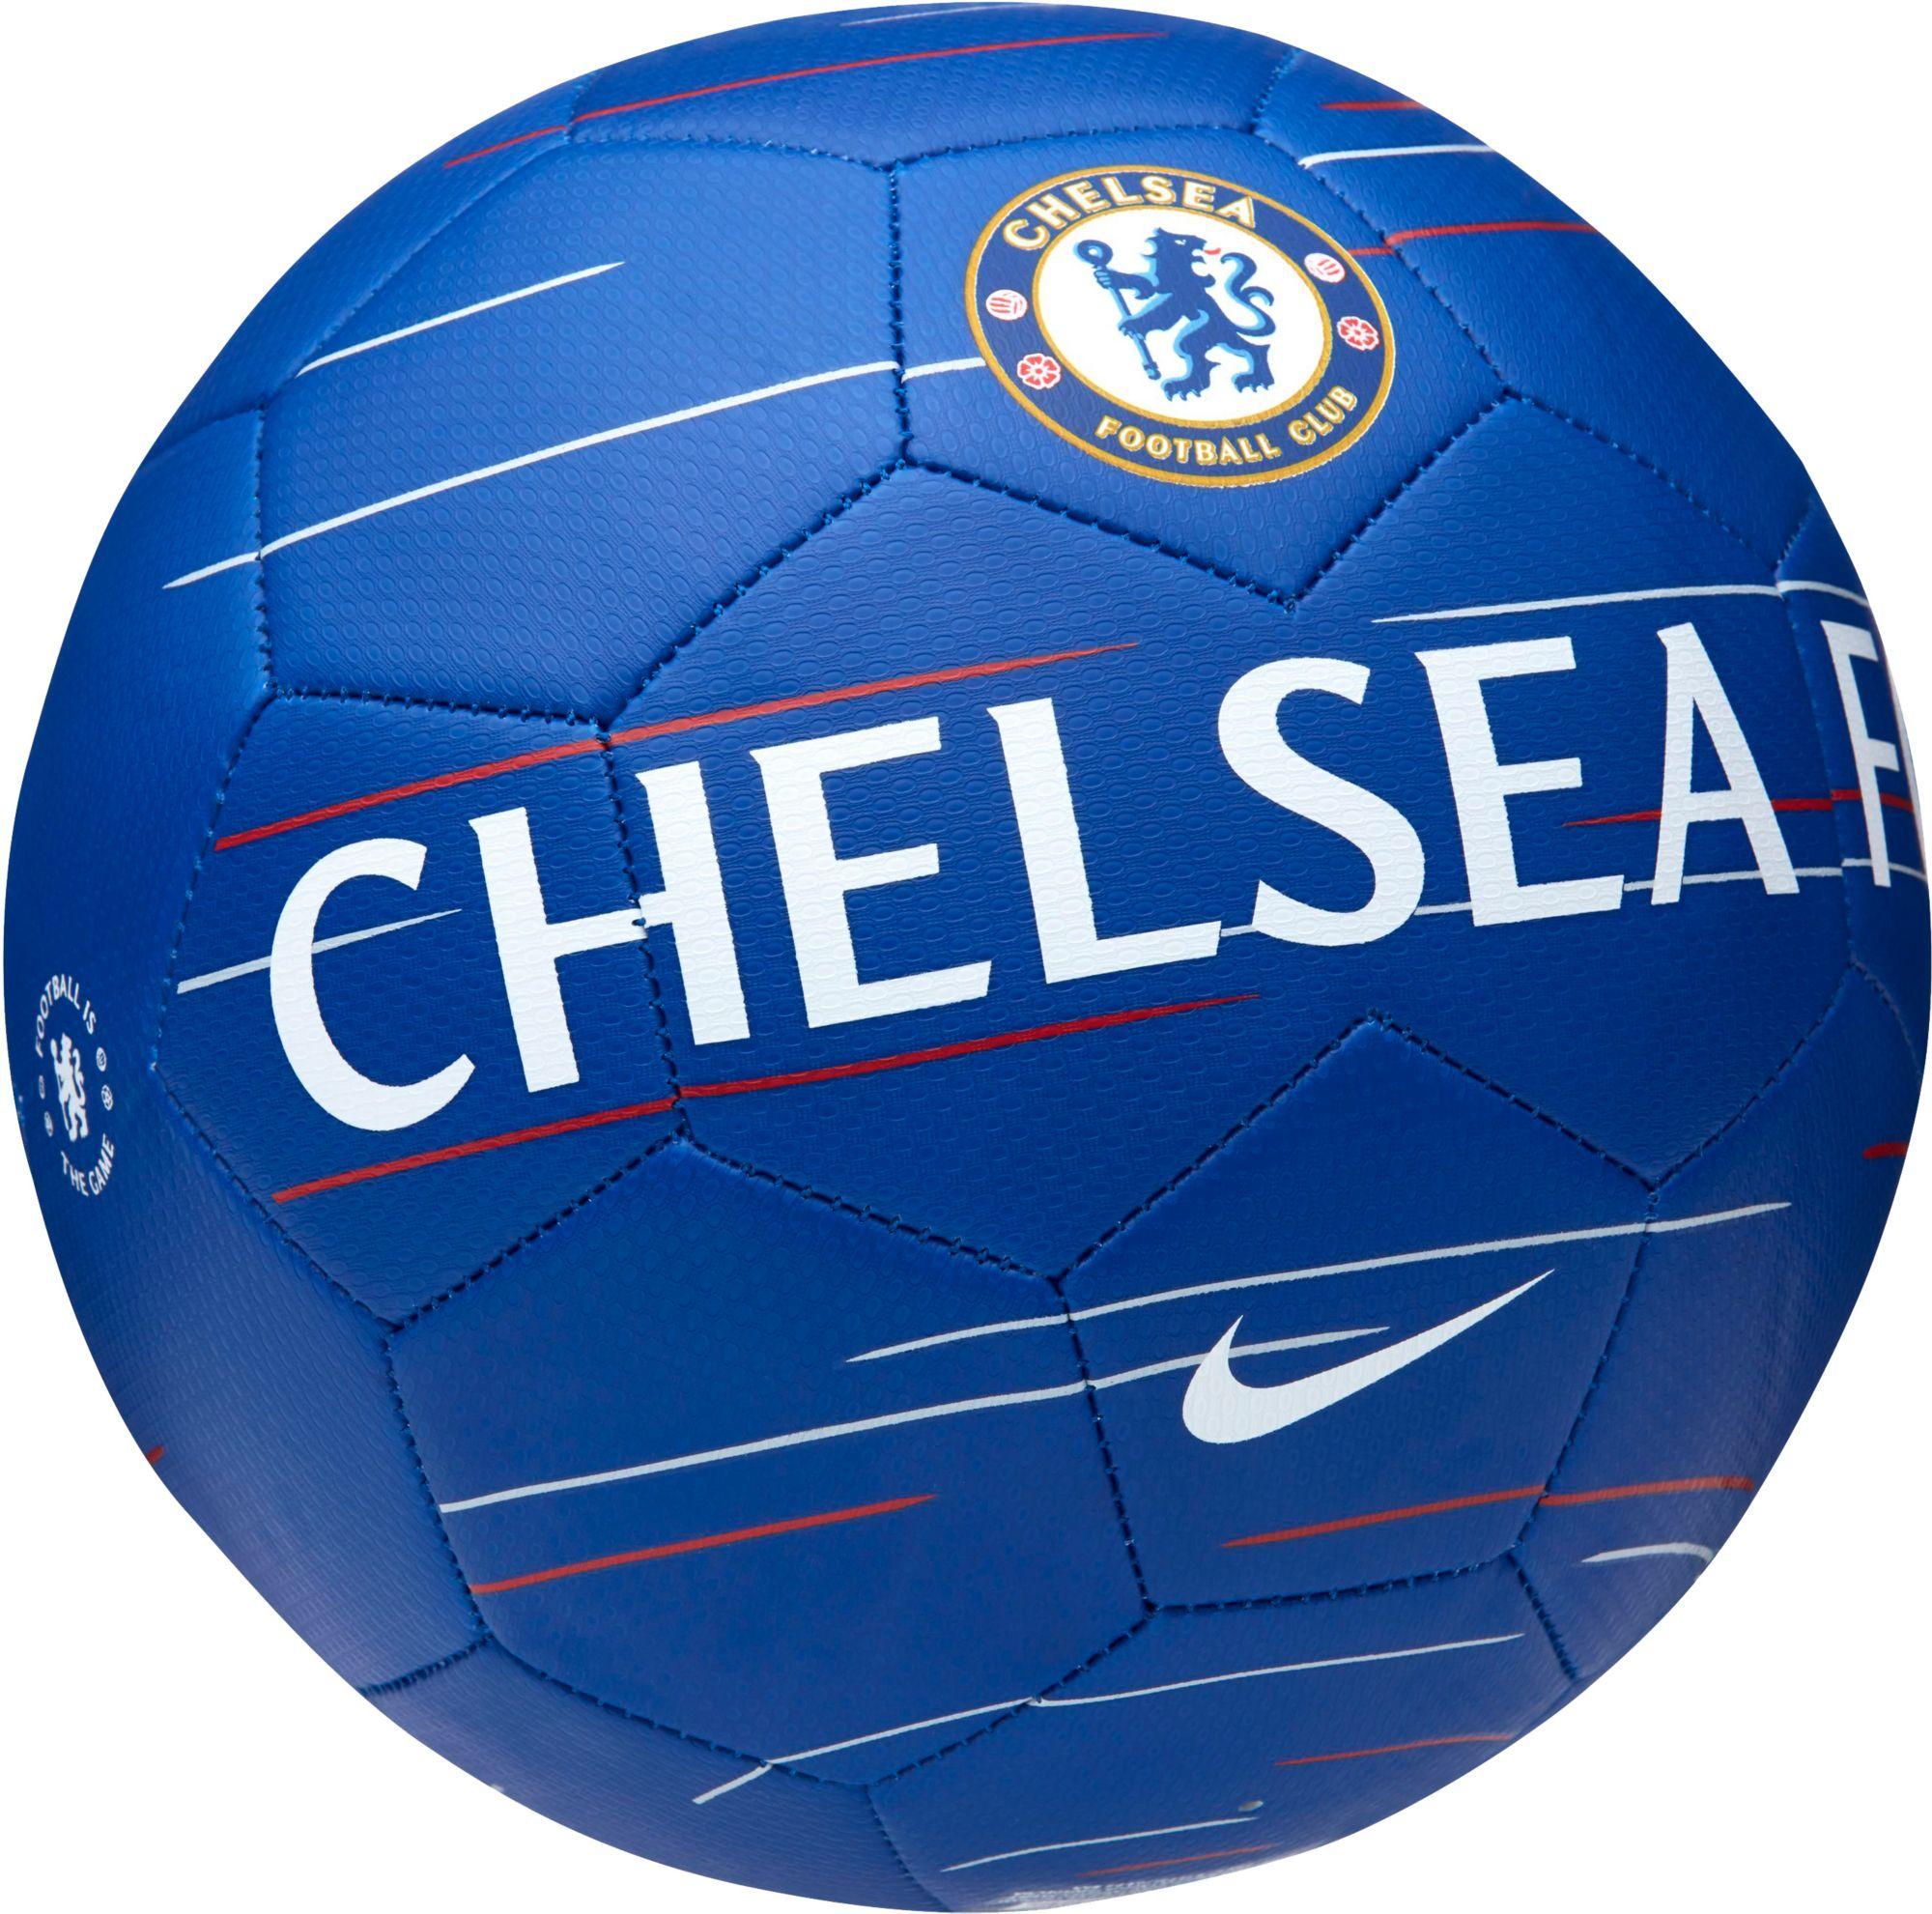 Nike Chelsea Supporters Prestige Soccer Ball in 2019  e8b93795cec4b